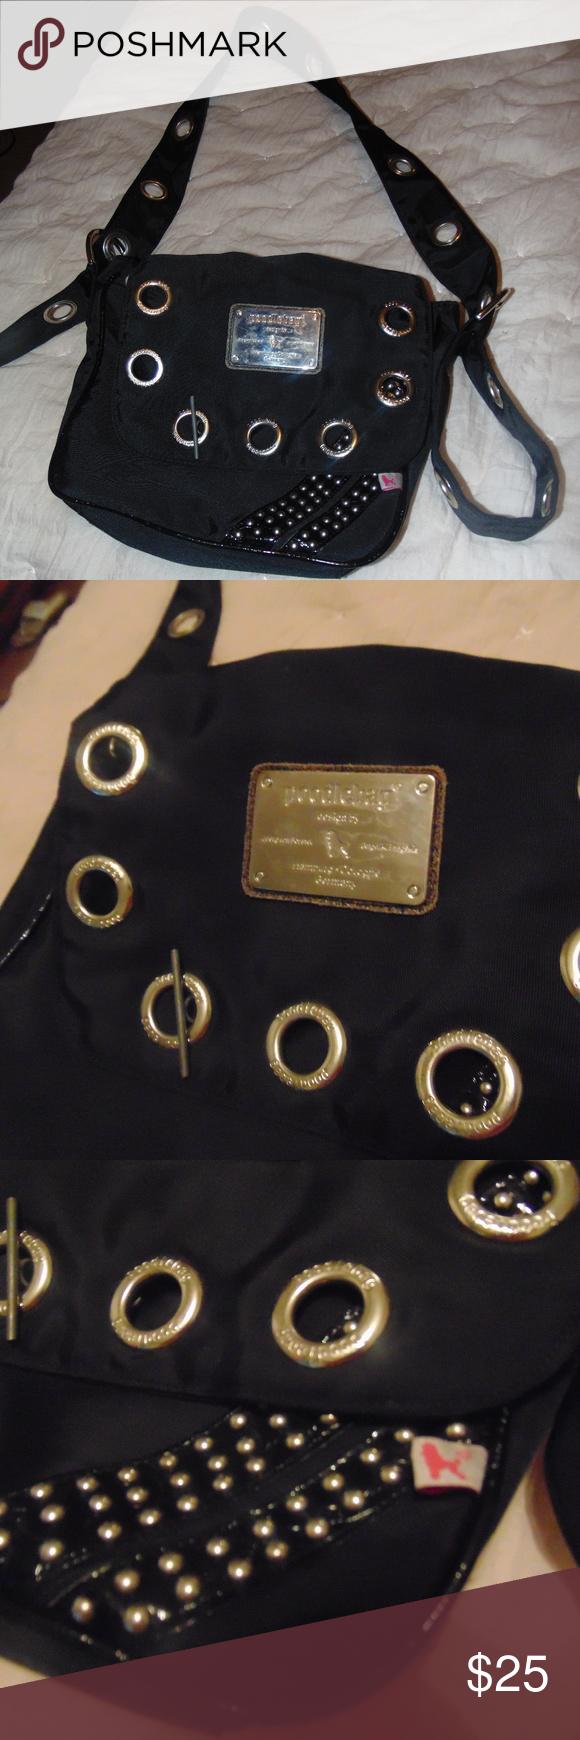 Poodle Bag Germany Unique Made In Crossbody Large Open Belt Strap